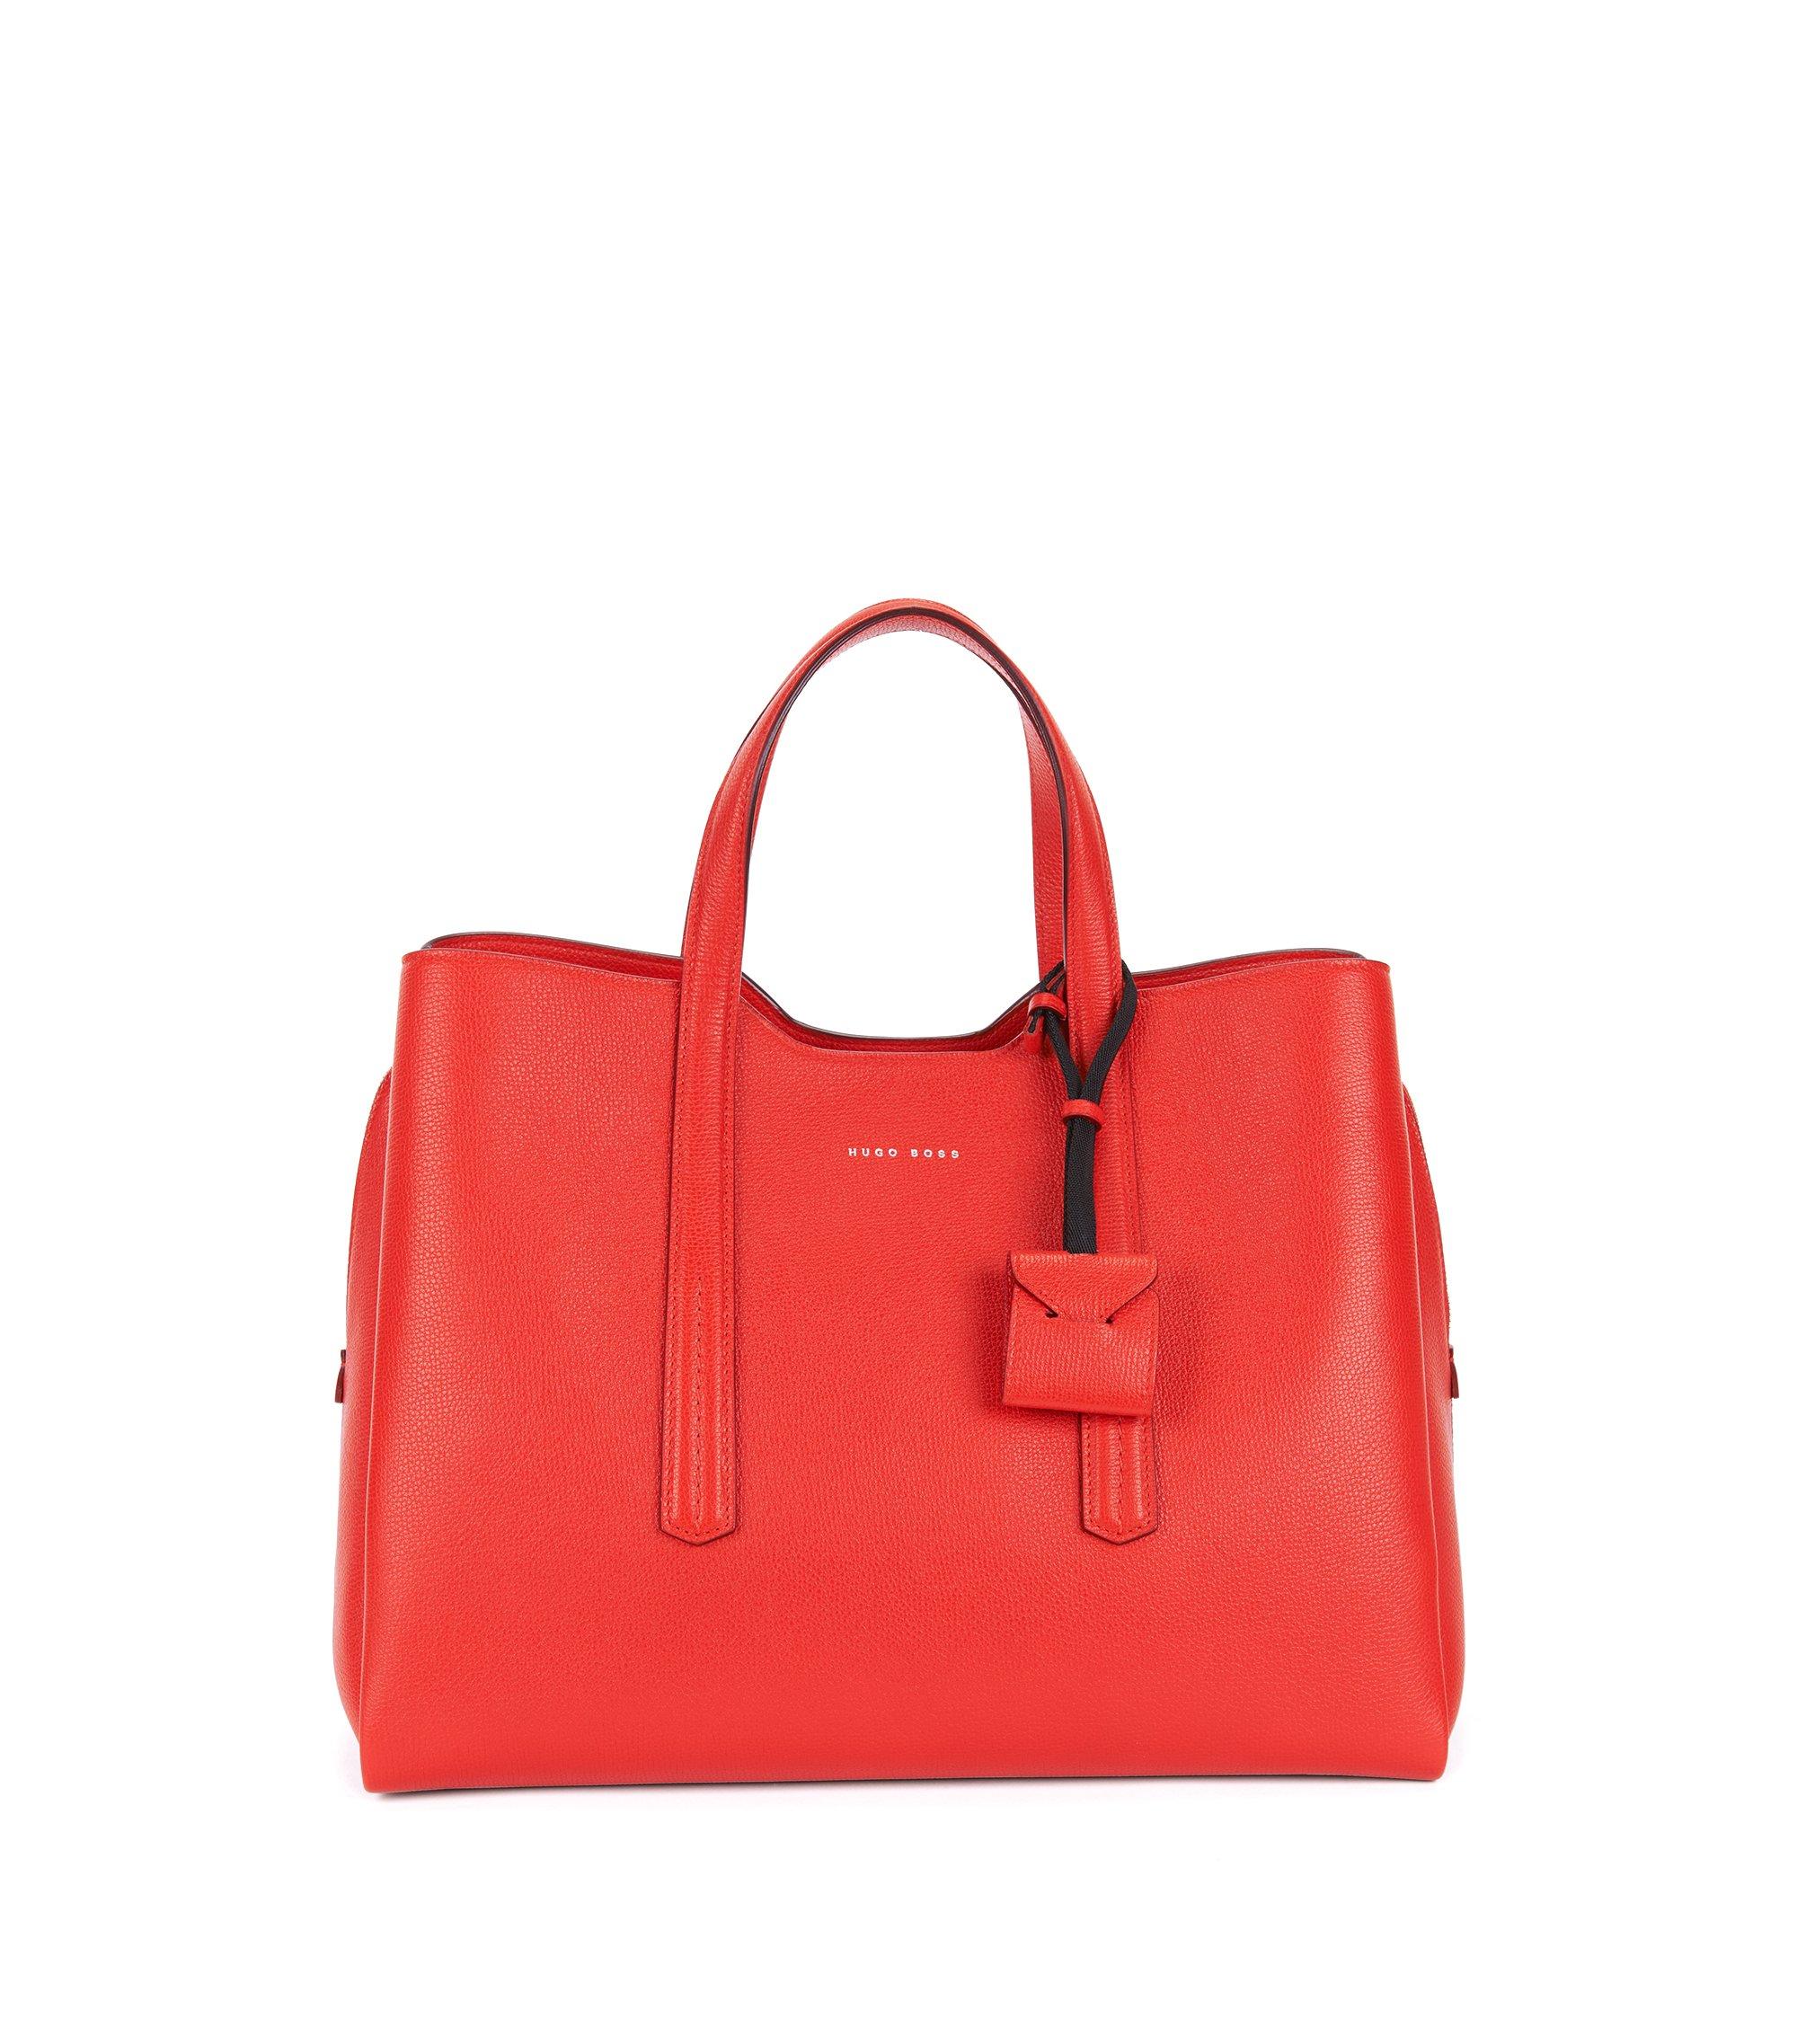 Tote Bag aus genarbtem italienischem Leder, Rot